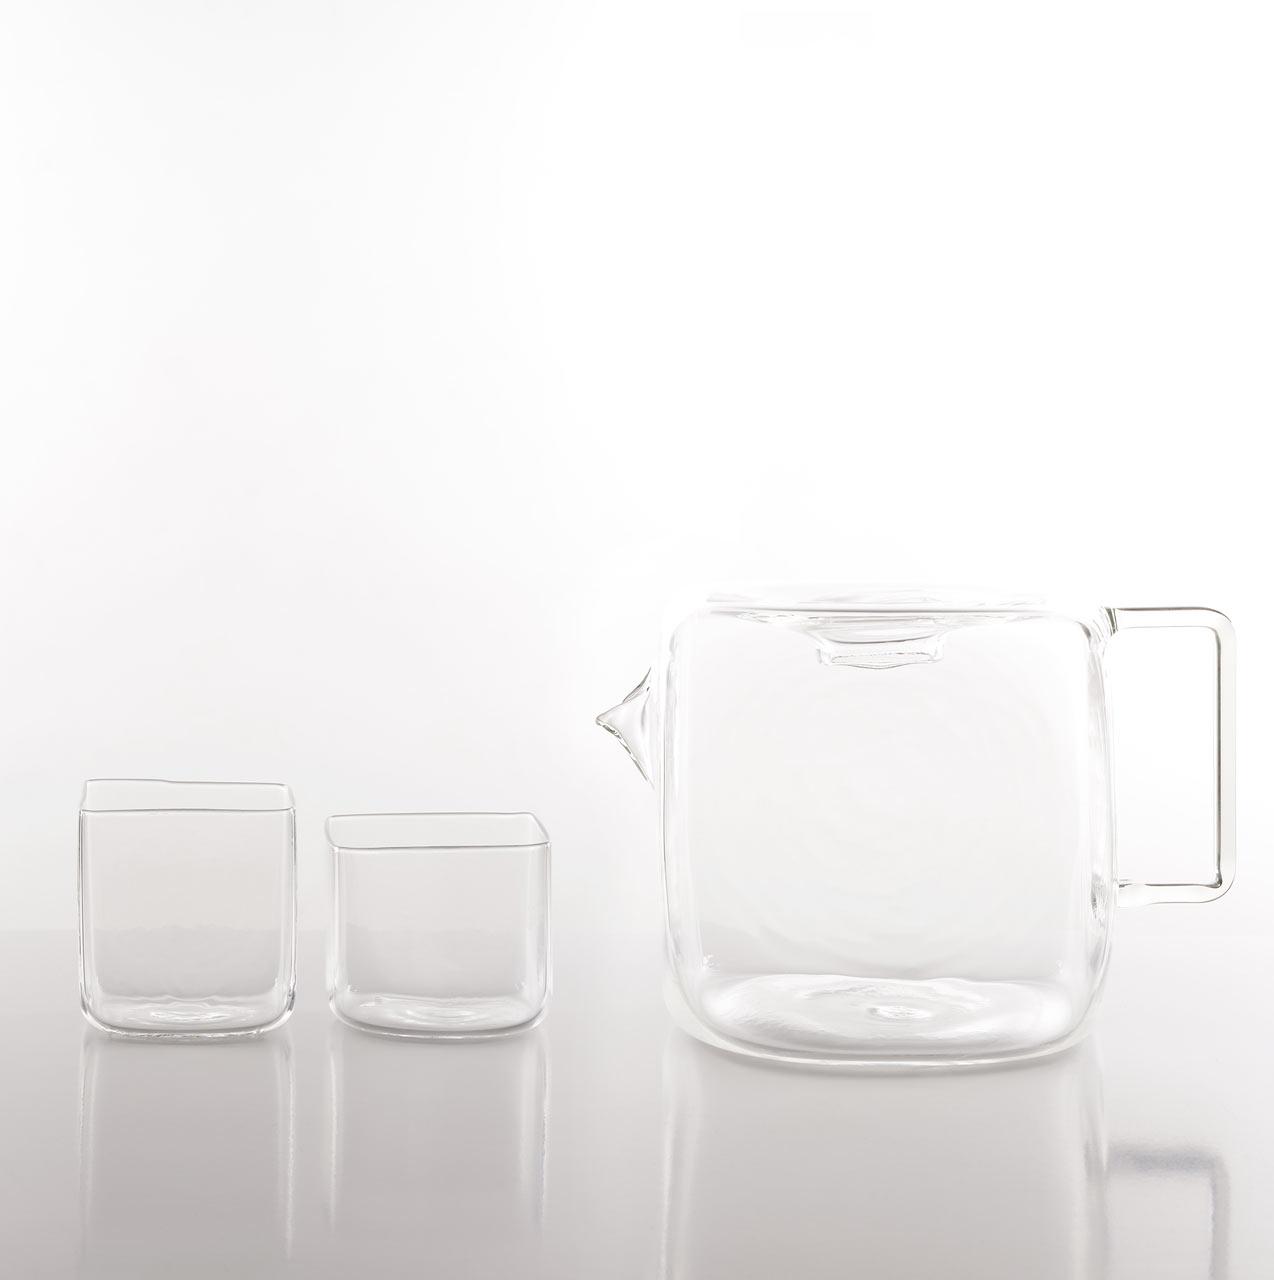 WATER-Carafe-Antonio-Arico-4